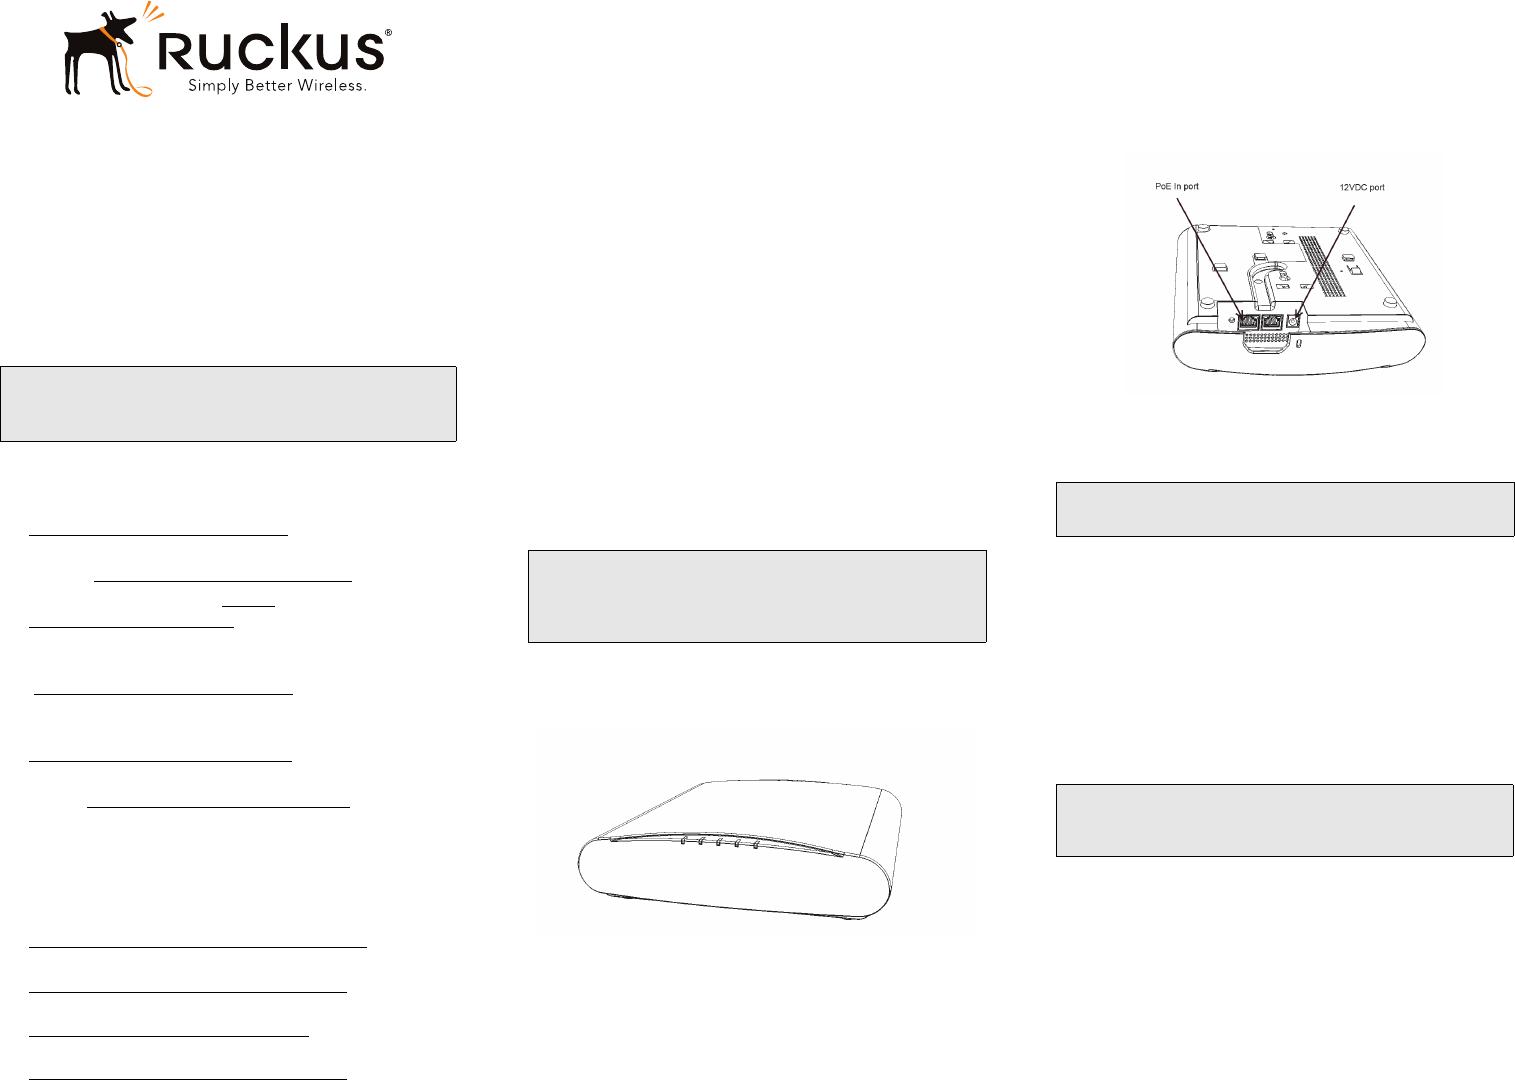 Ruckus R500 Quick Setup Guide R610 (QSG) QSG